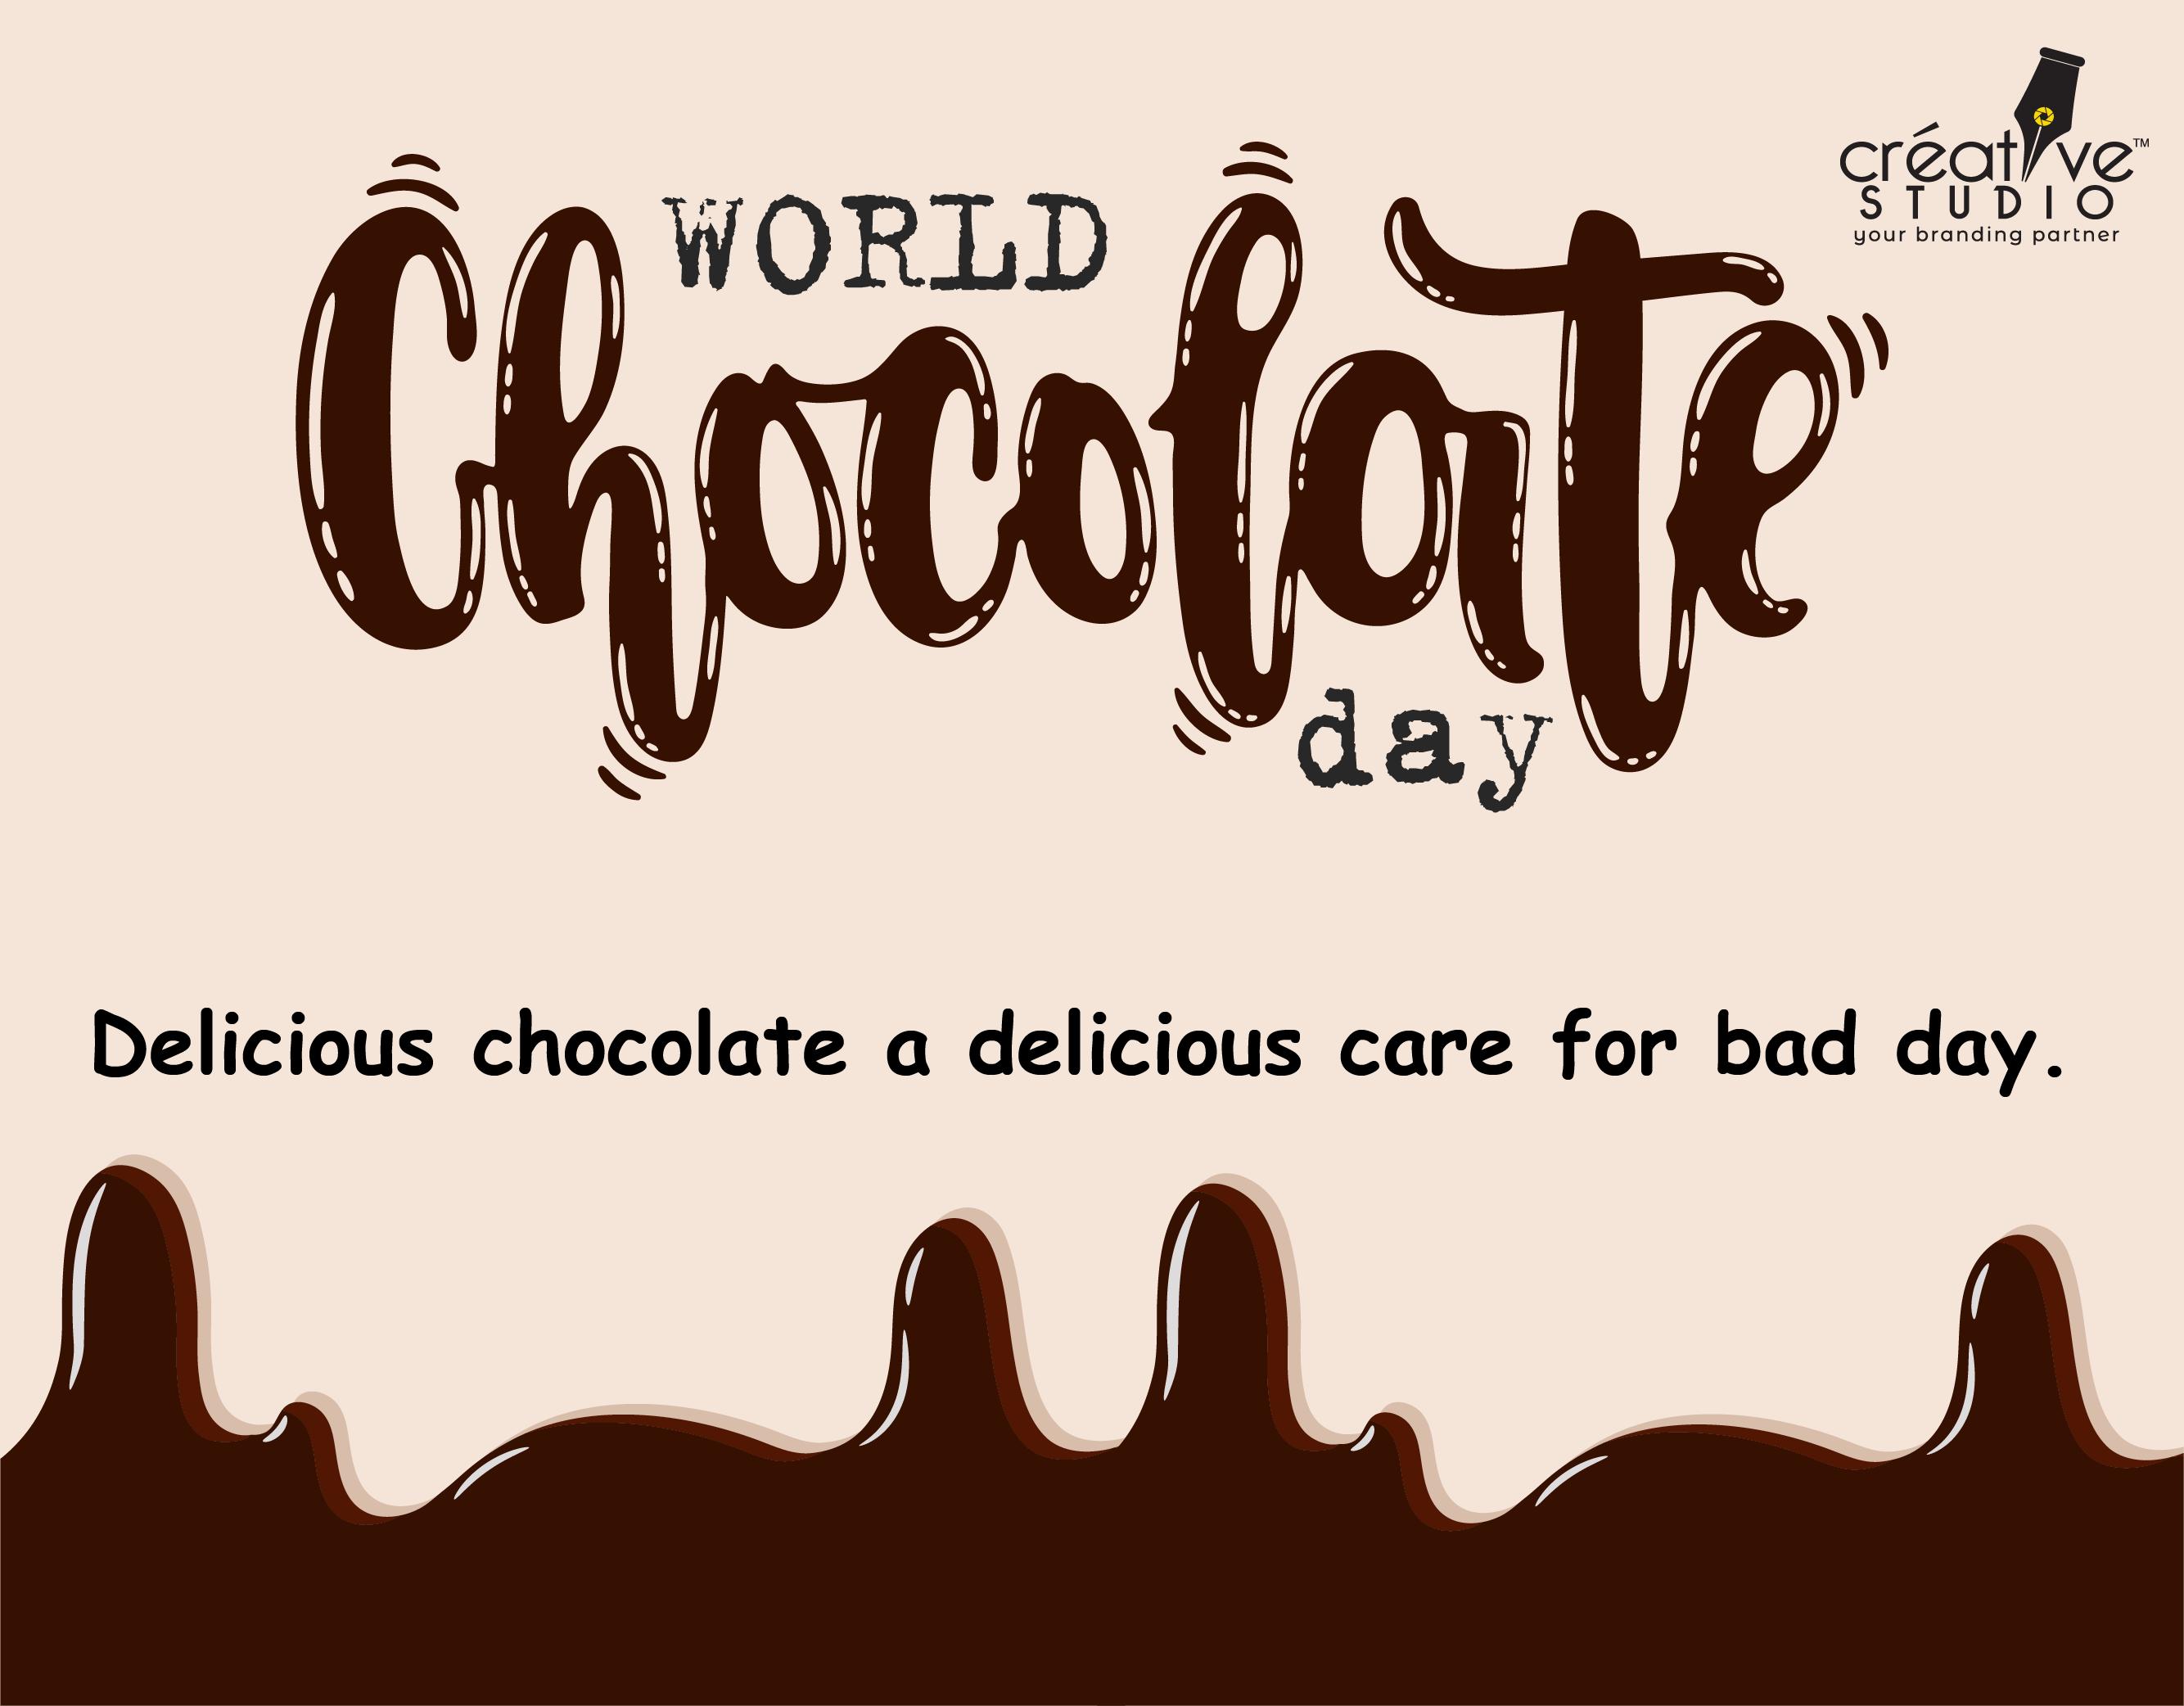 CHOCOLATE DAY 03 - Chocolate